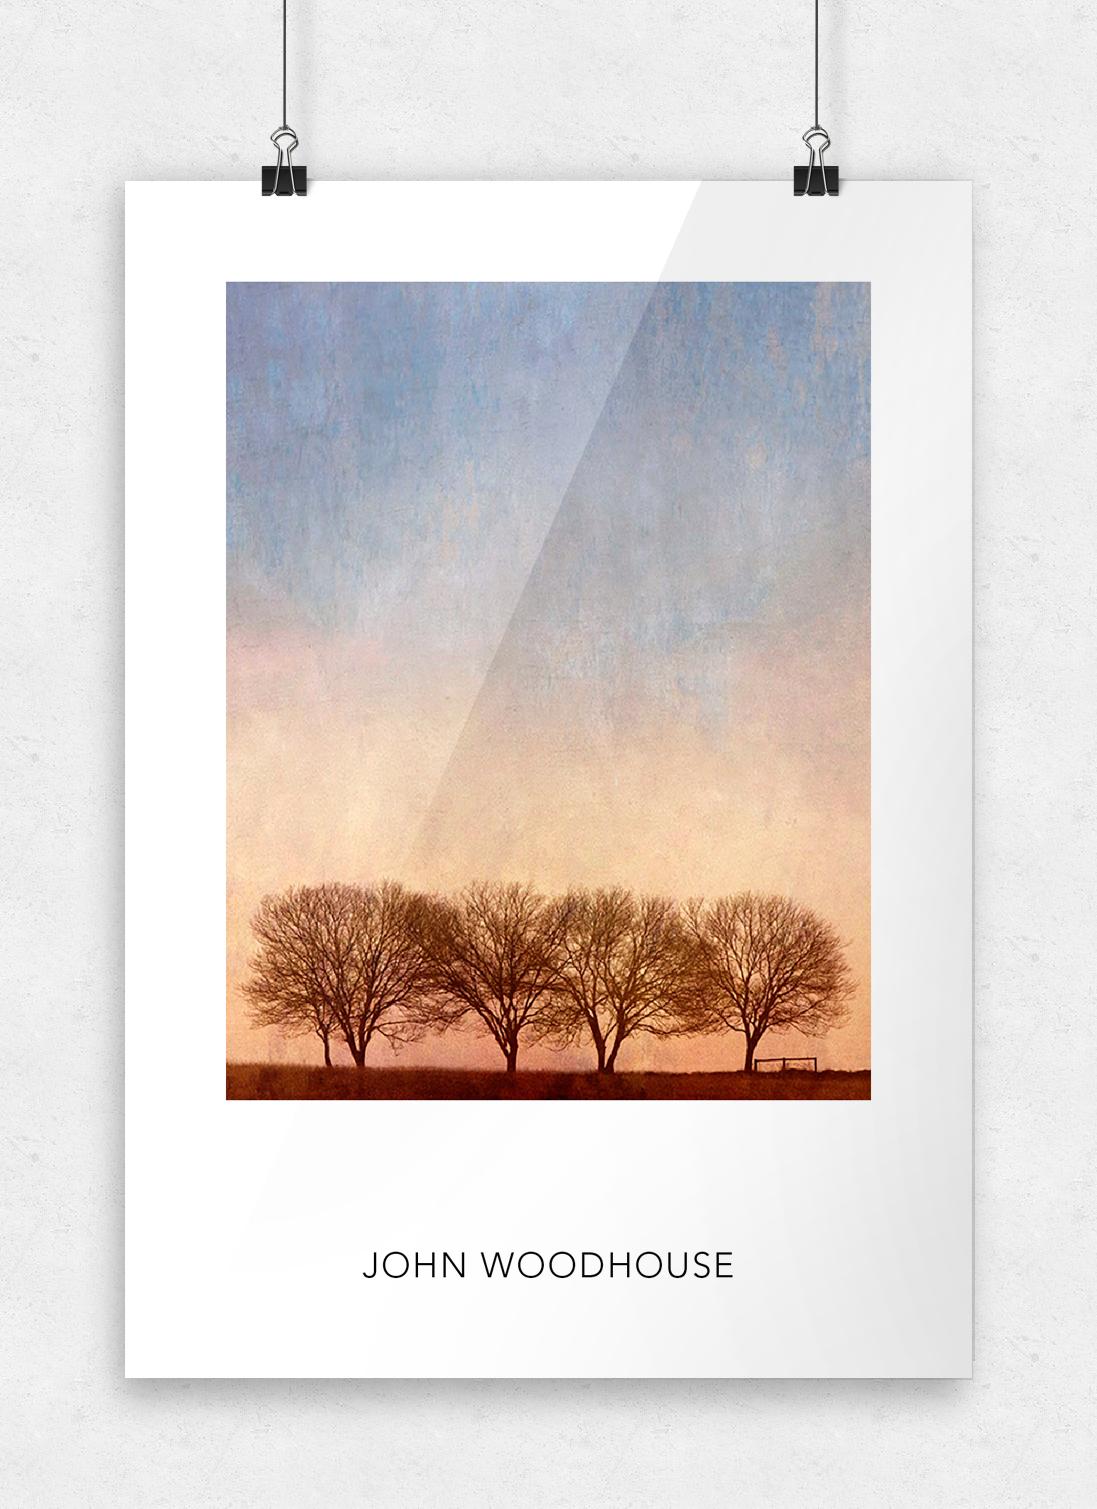 JW-Posters-Template_05.jpg